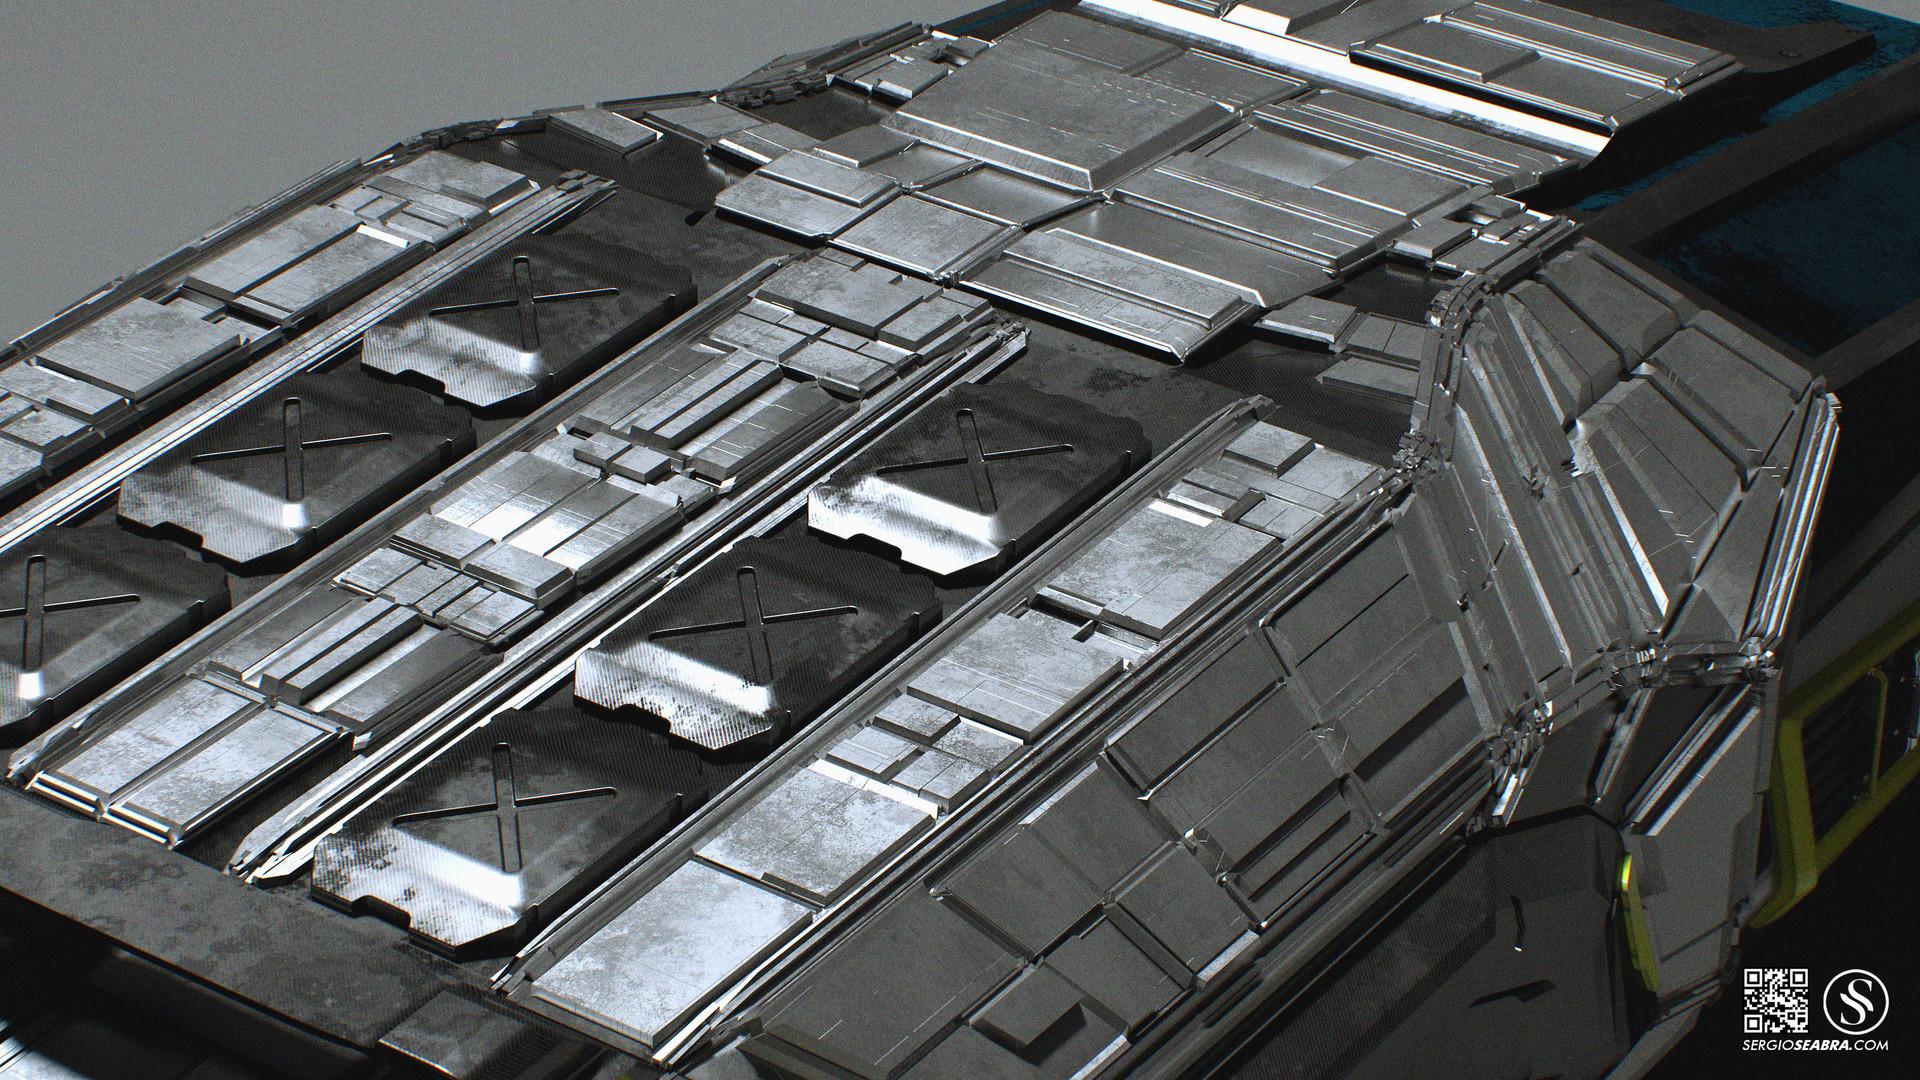 Sergio seabra 201810 veh mars rover layout5 ss